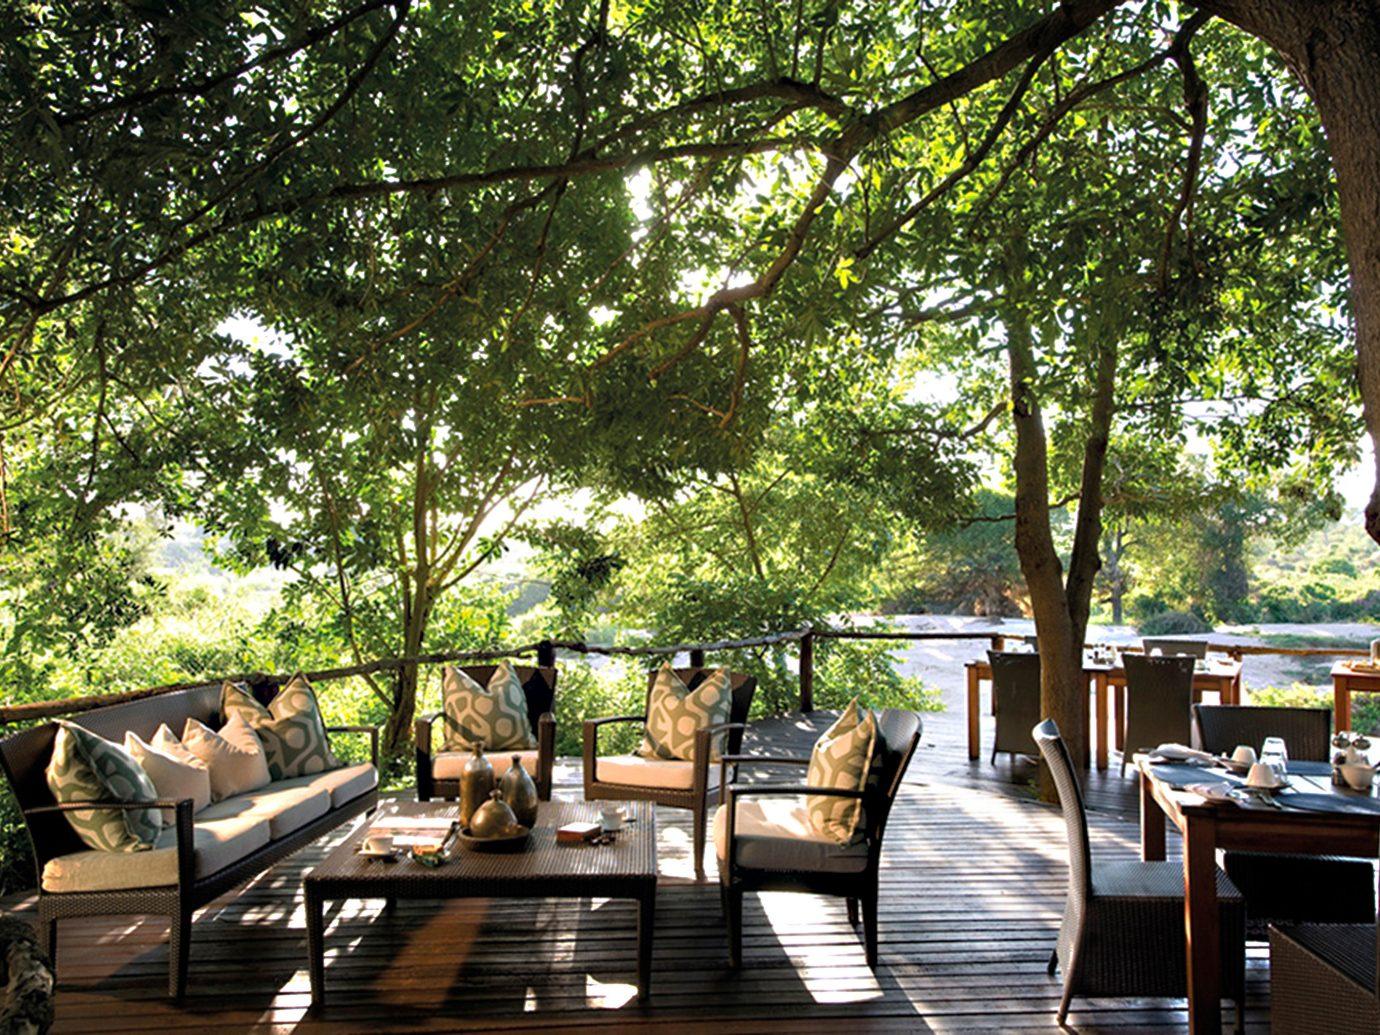 Trip Ideas tree table estate backyard Garden outdoor structure Courtyard flower Resort furniture wood several